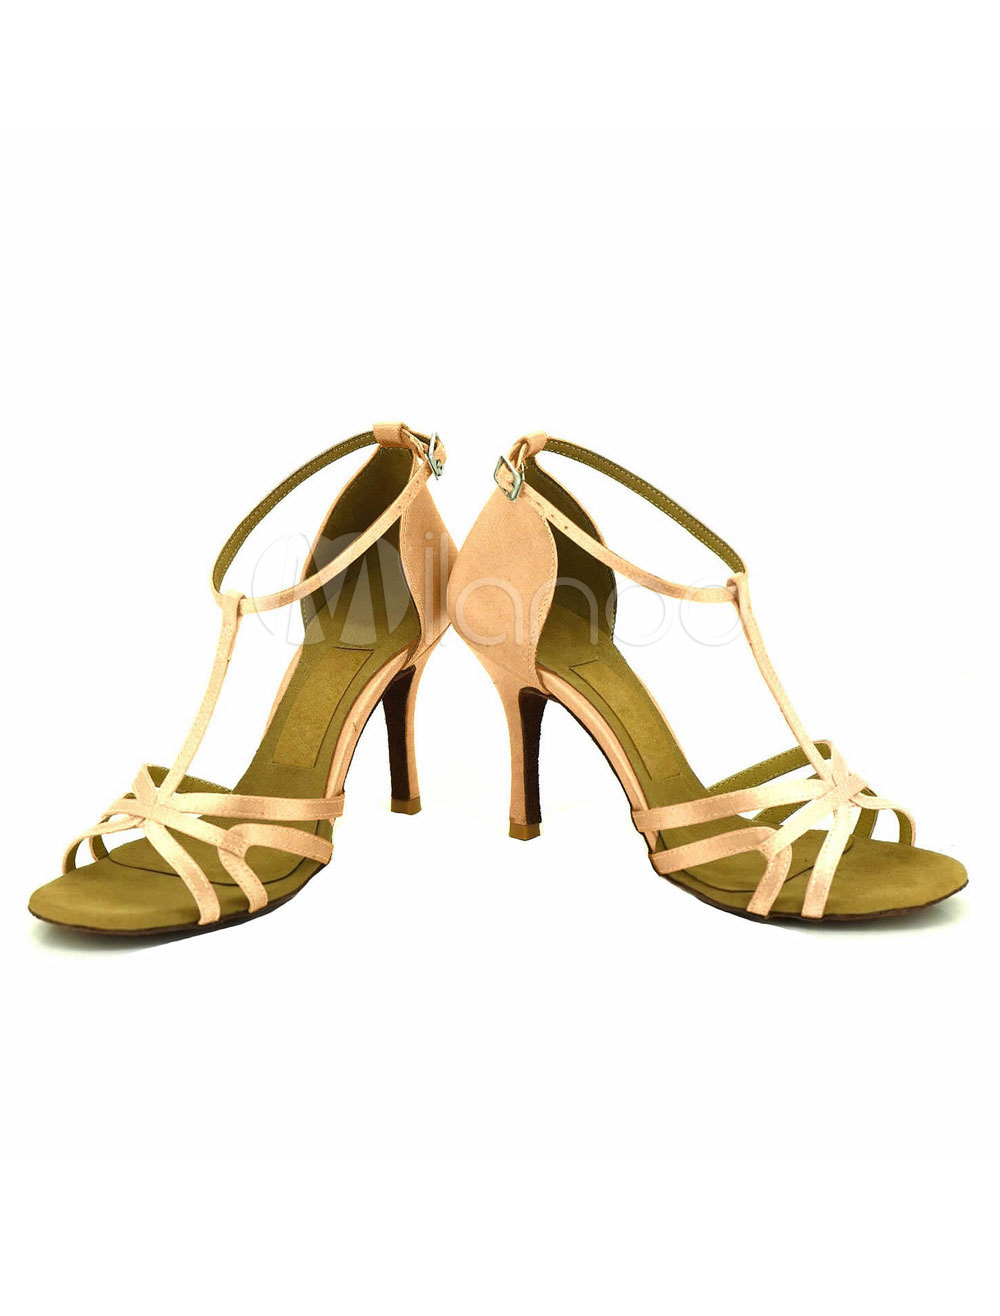 Raso de baile zapatos albaricoque abierto T tipo vendaje abultado punta de aguja zapatos de salón de baile modificado para requisitos particulares EuNr2H